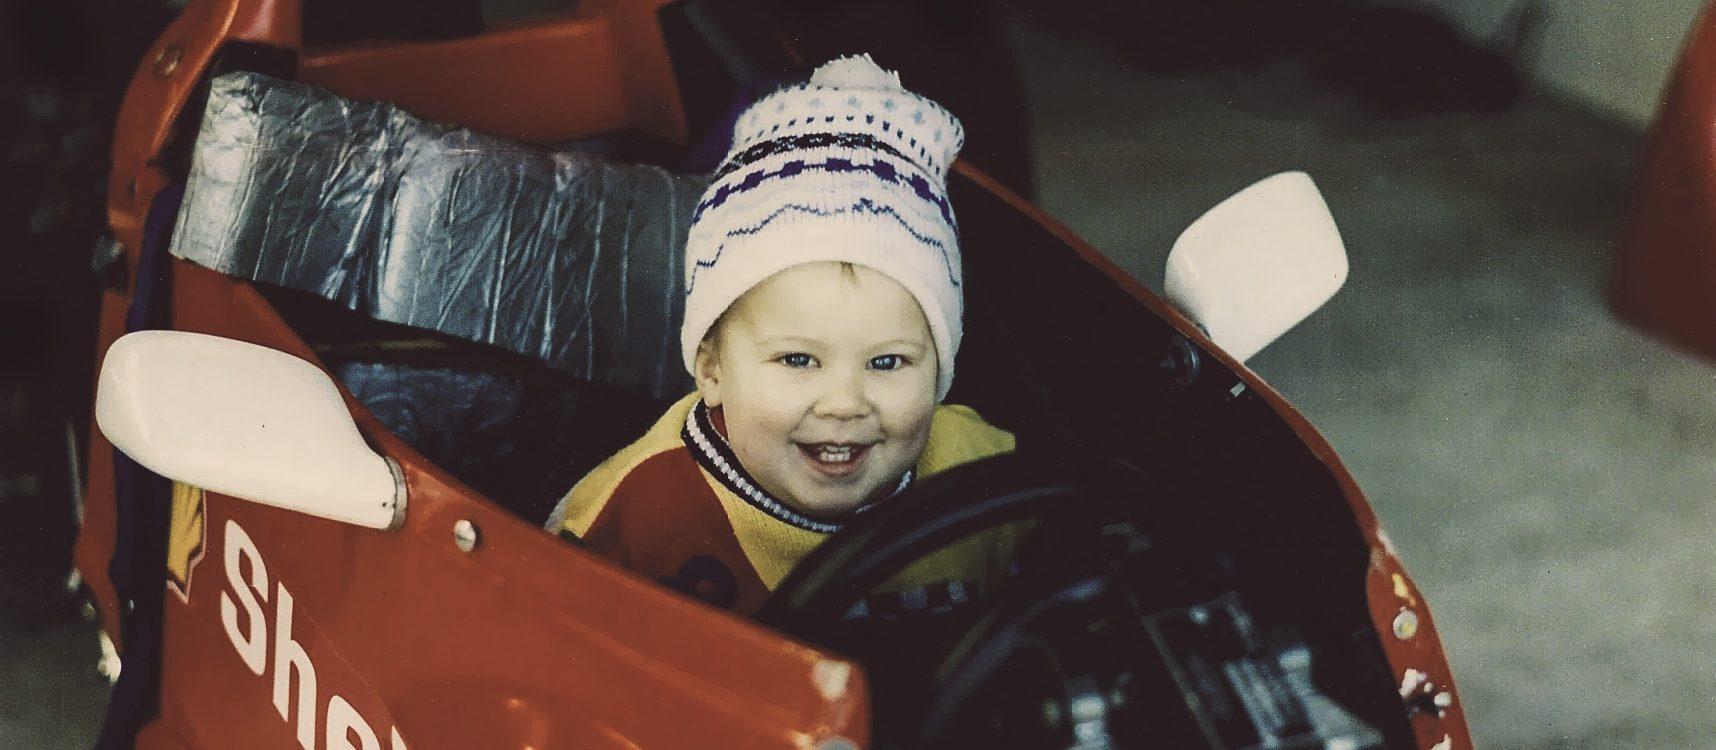 Jono Lester as a bady, sitting in a Formula Ford race car